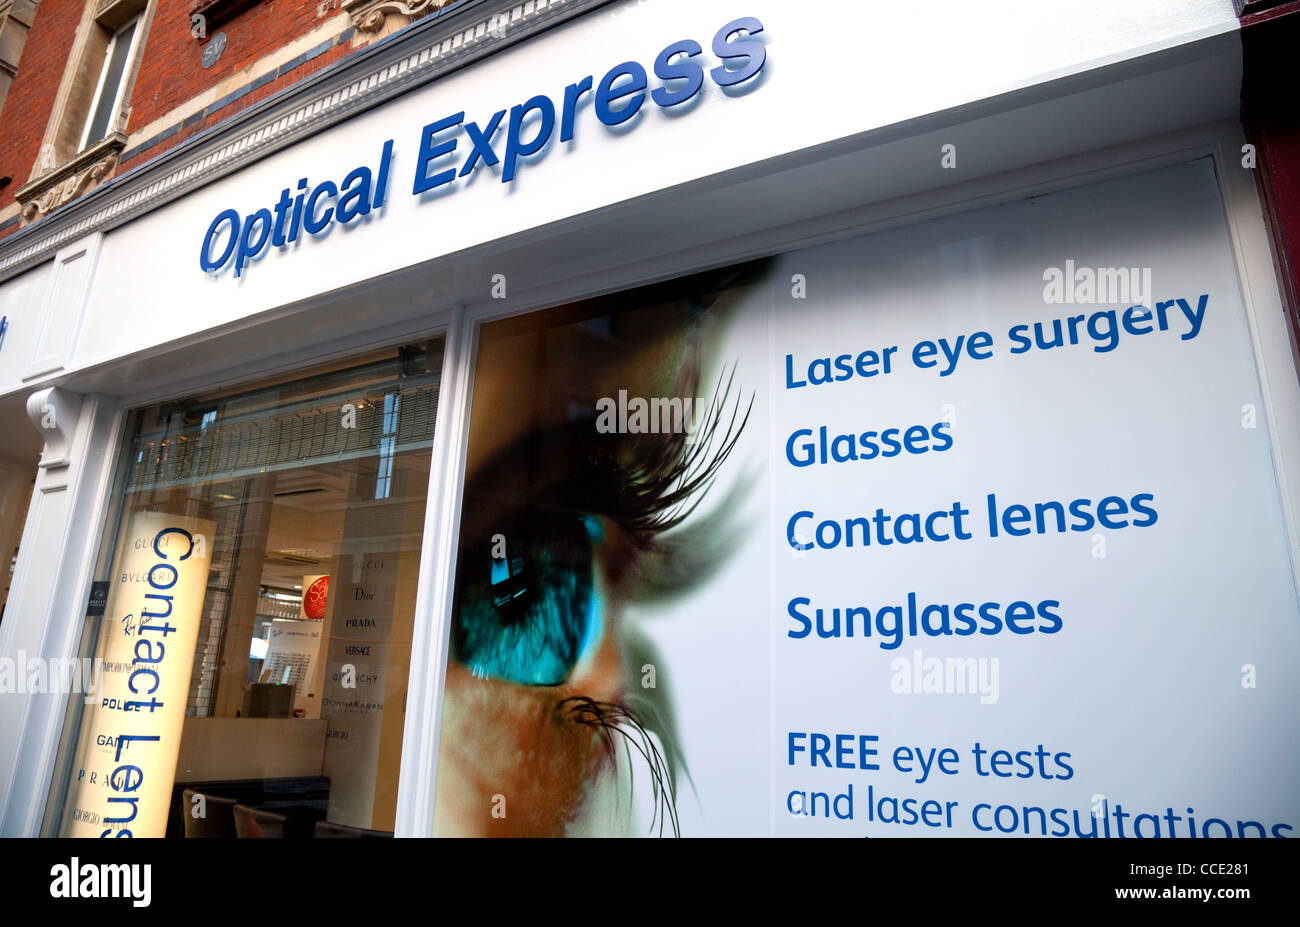 Optical express optician shop window, Cambridge UK - Stock Image